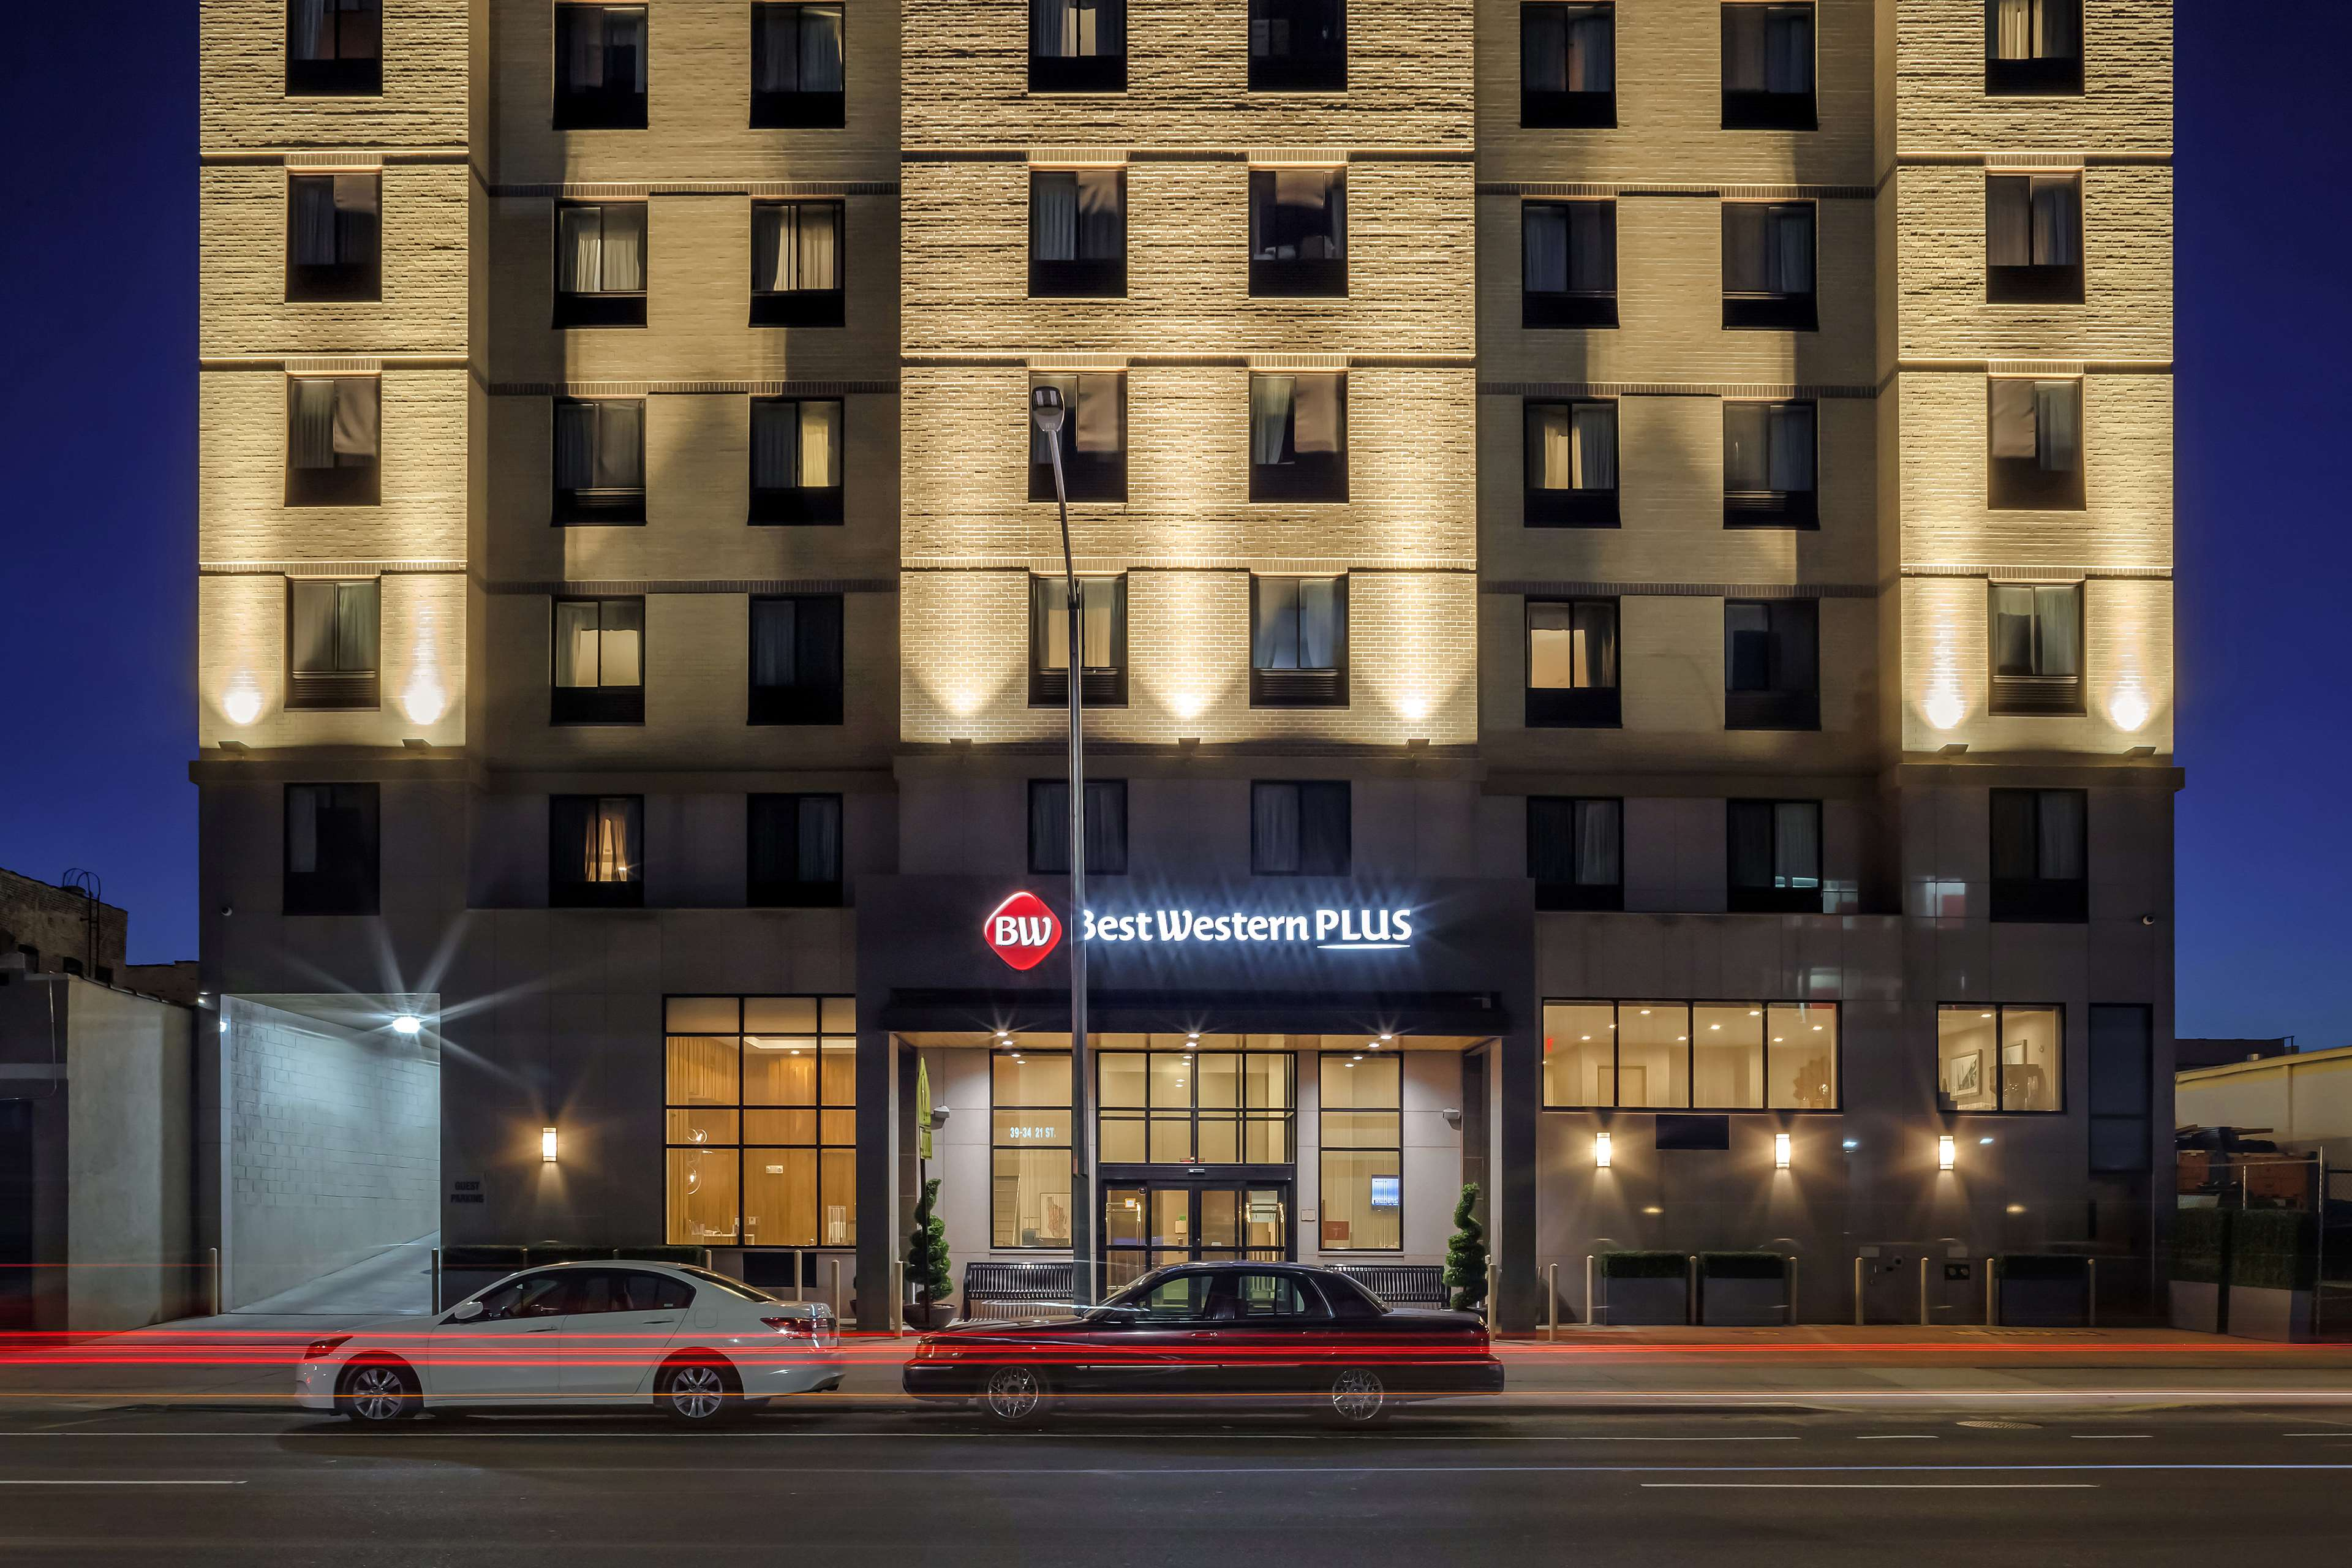 Best Western Plus Plaza Hotel image 3